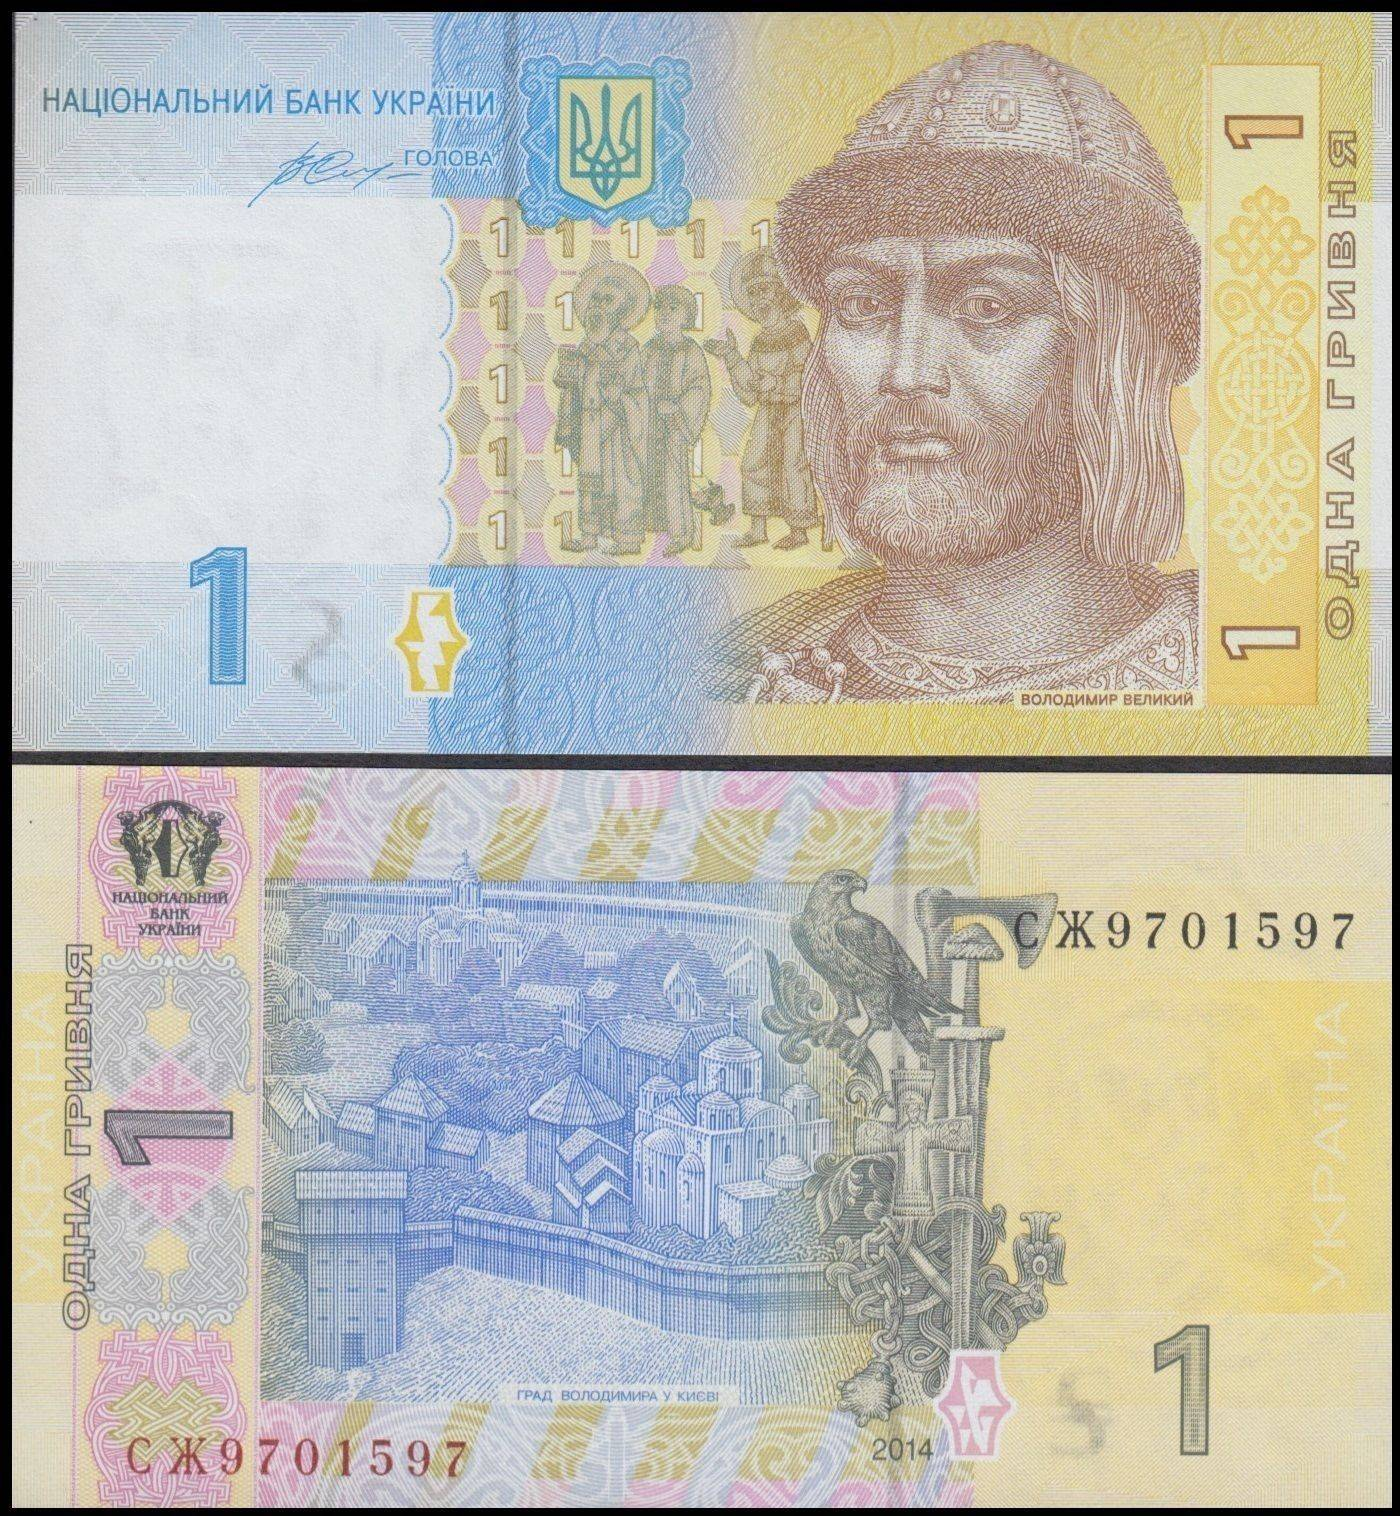 UKRAINE -  1 HRYVNIA 2014 (UNC)